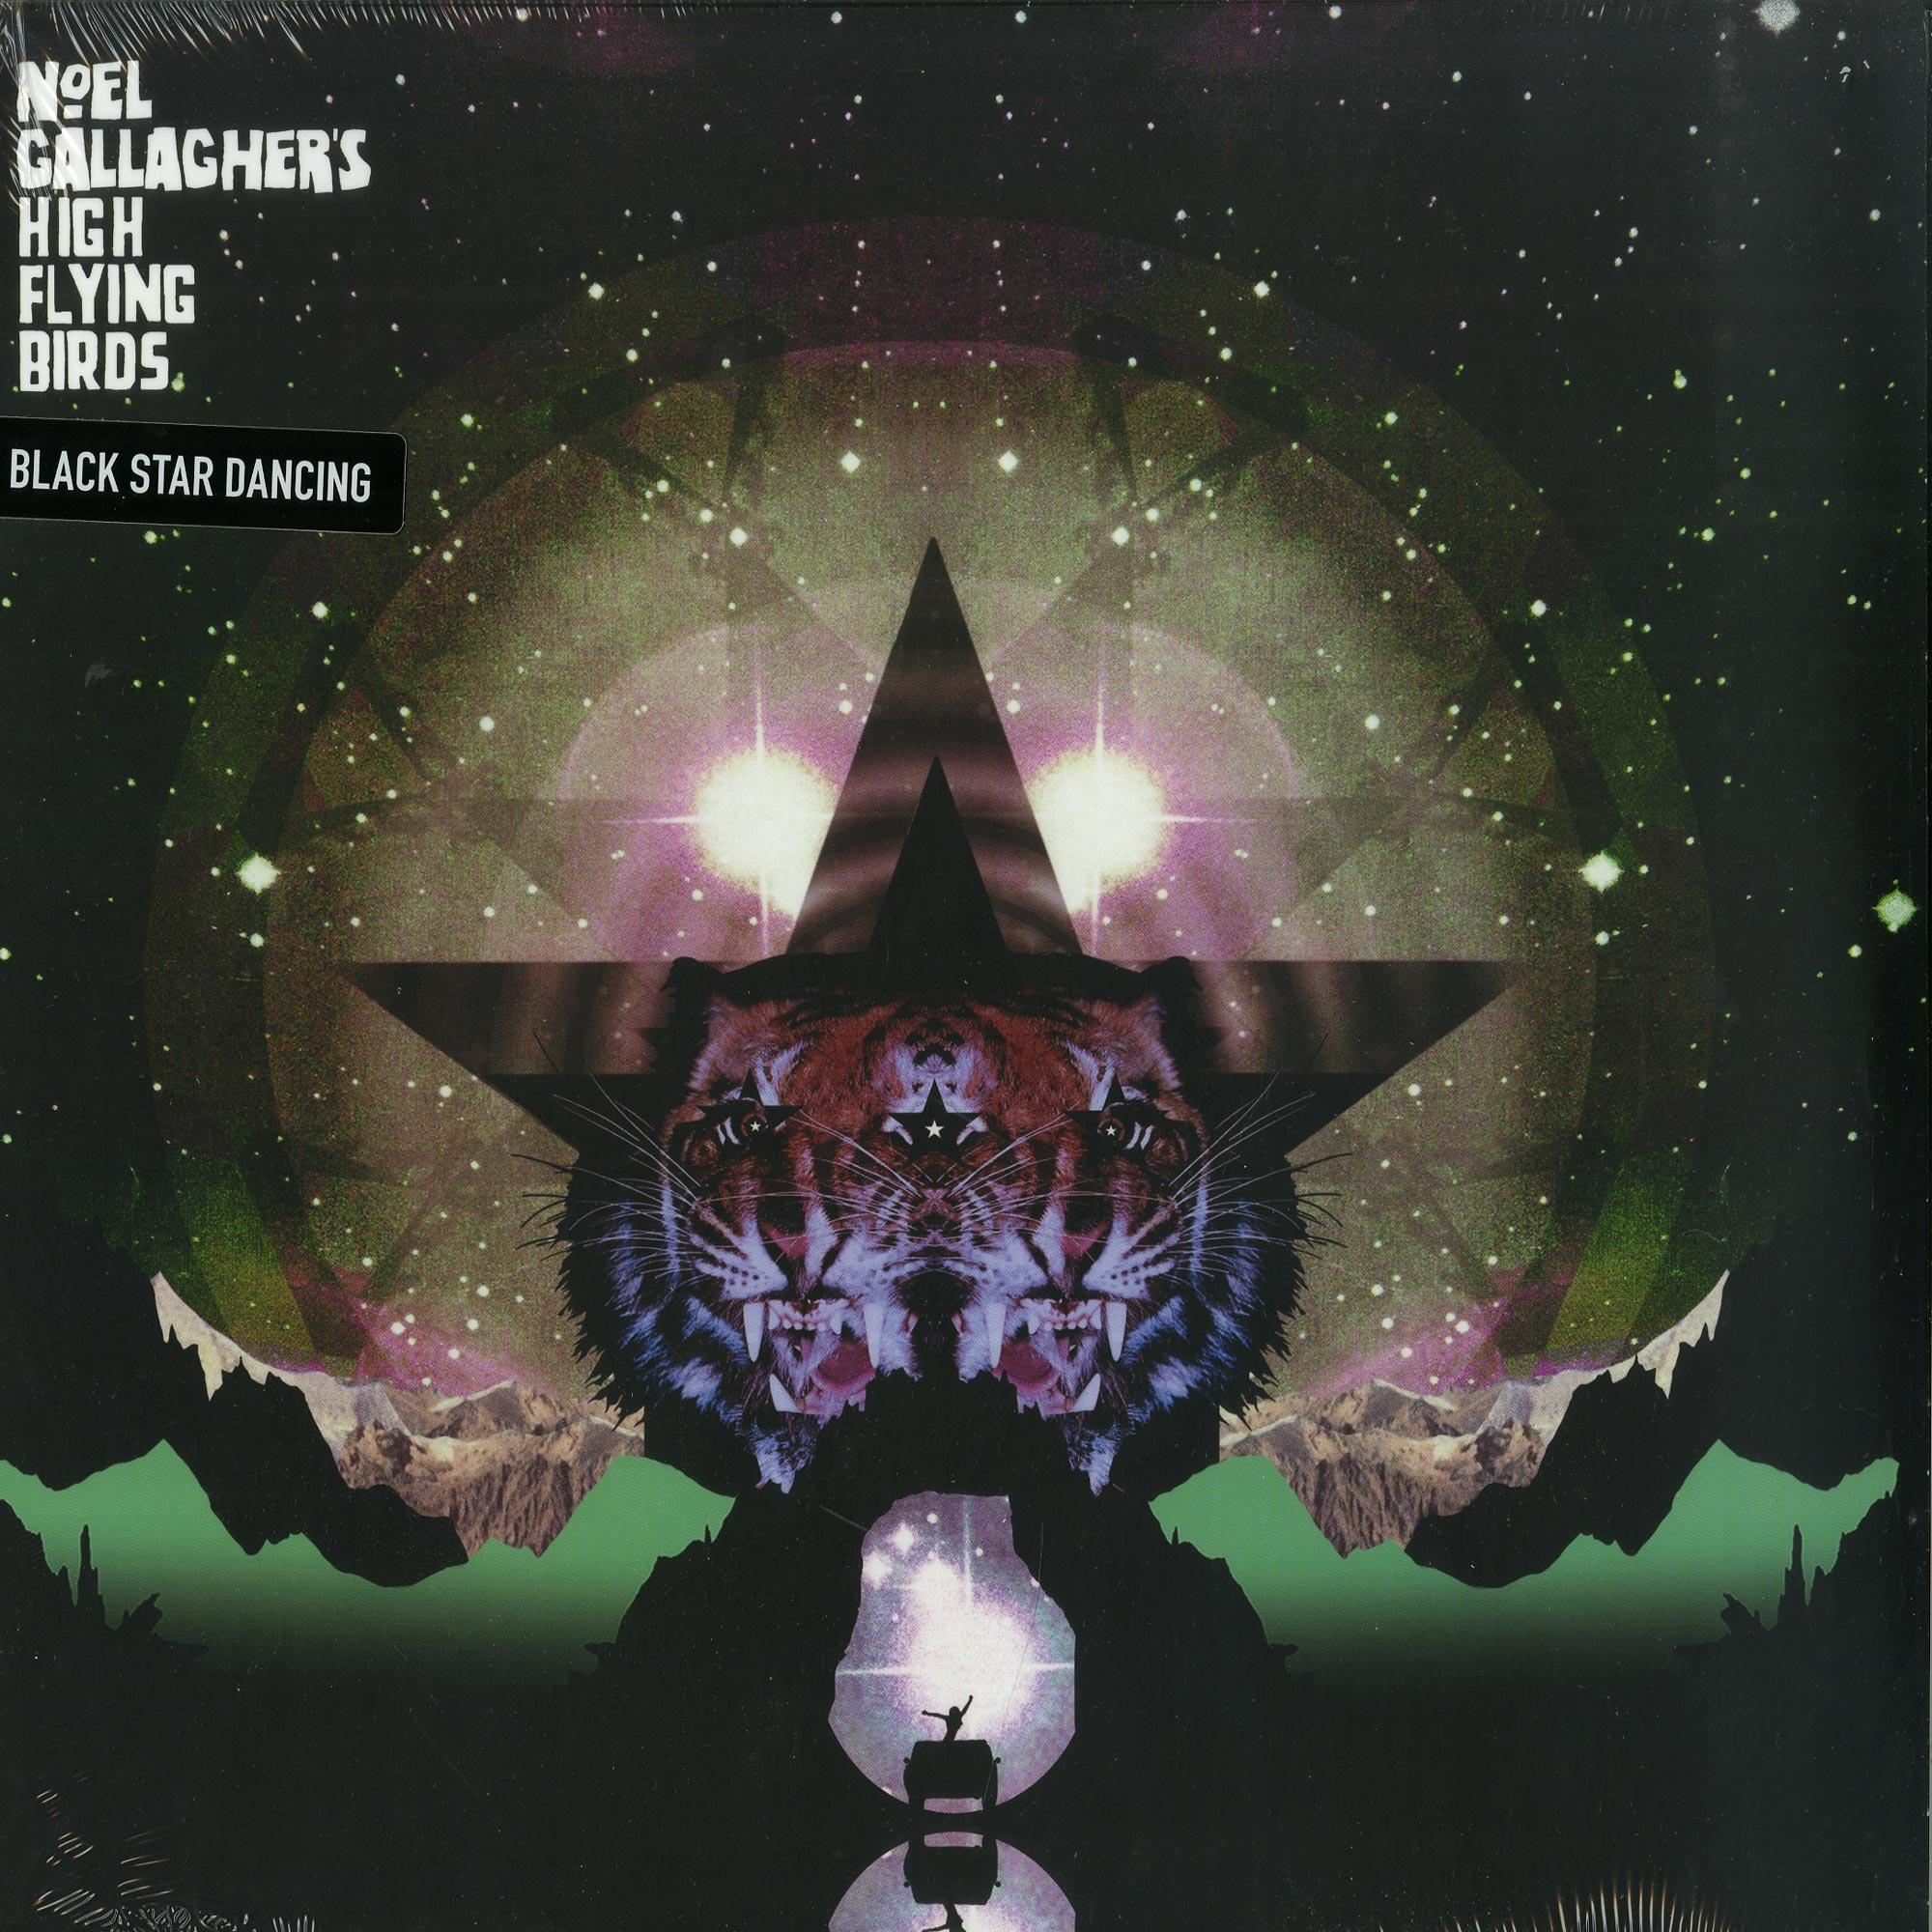 Noel Gallaghers High Flying Birds - BLACK STAR DANCING EP